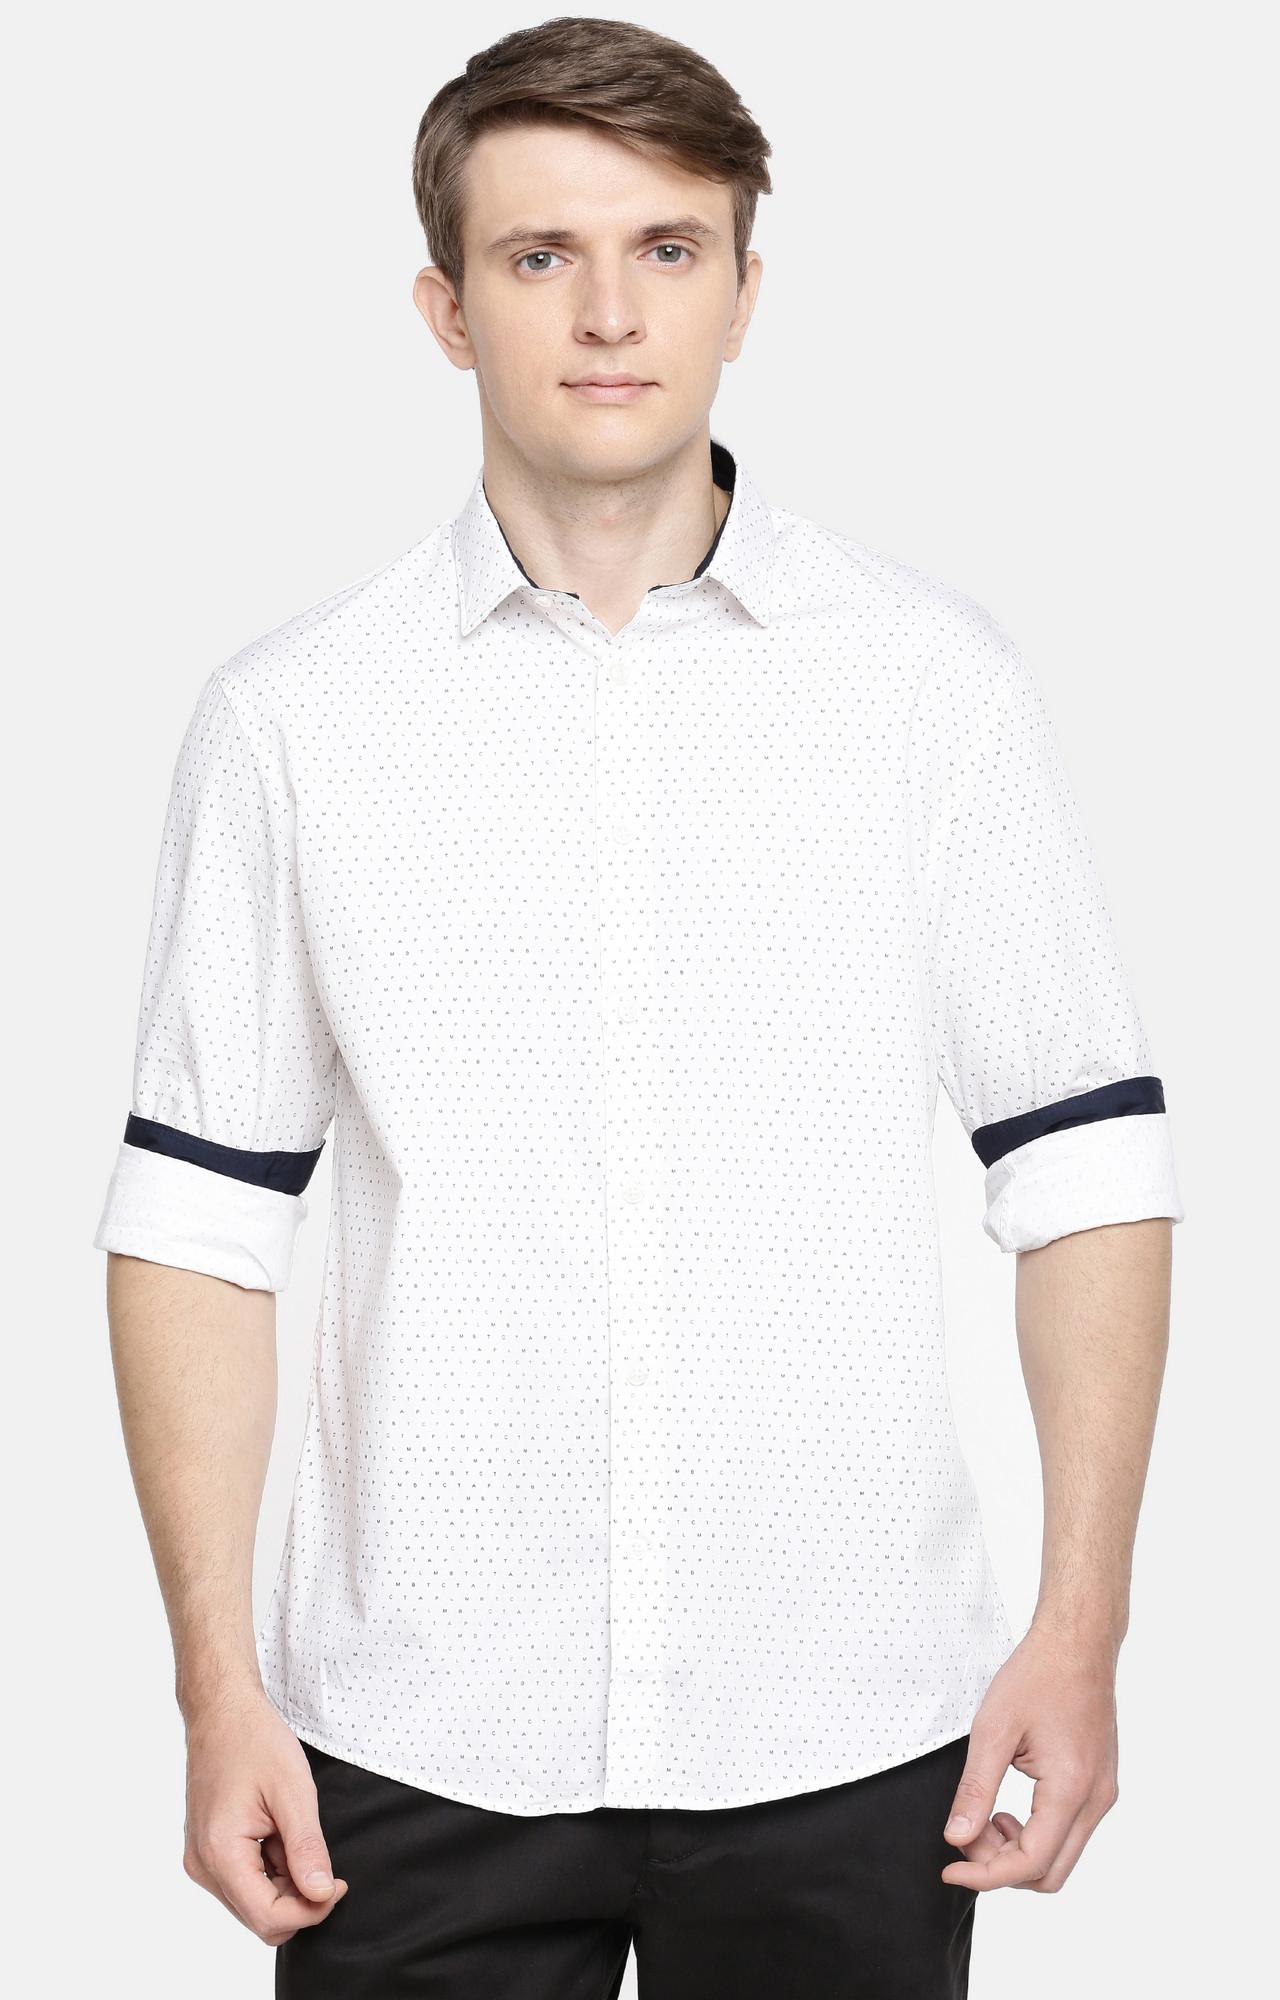 celio | White Solid Casual Shirt